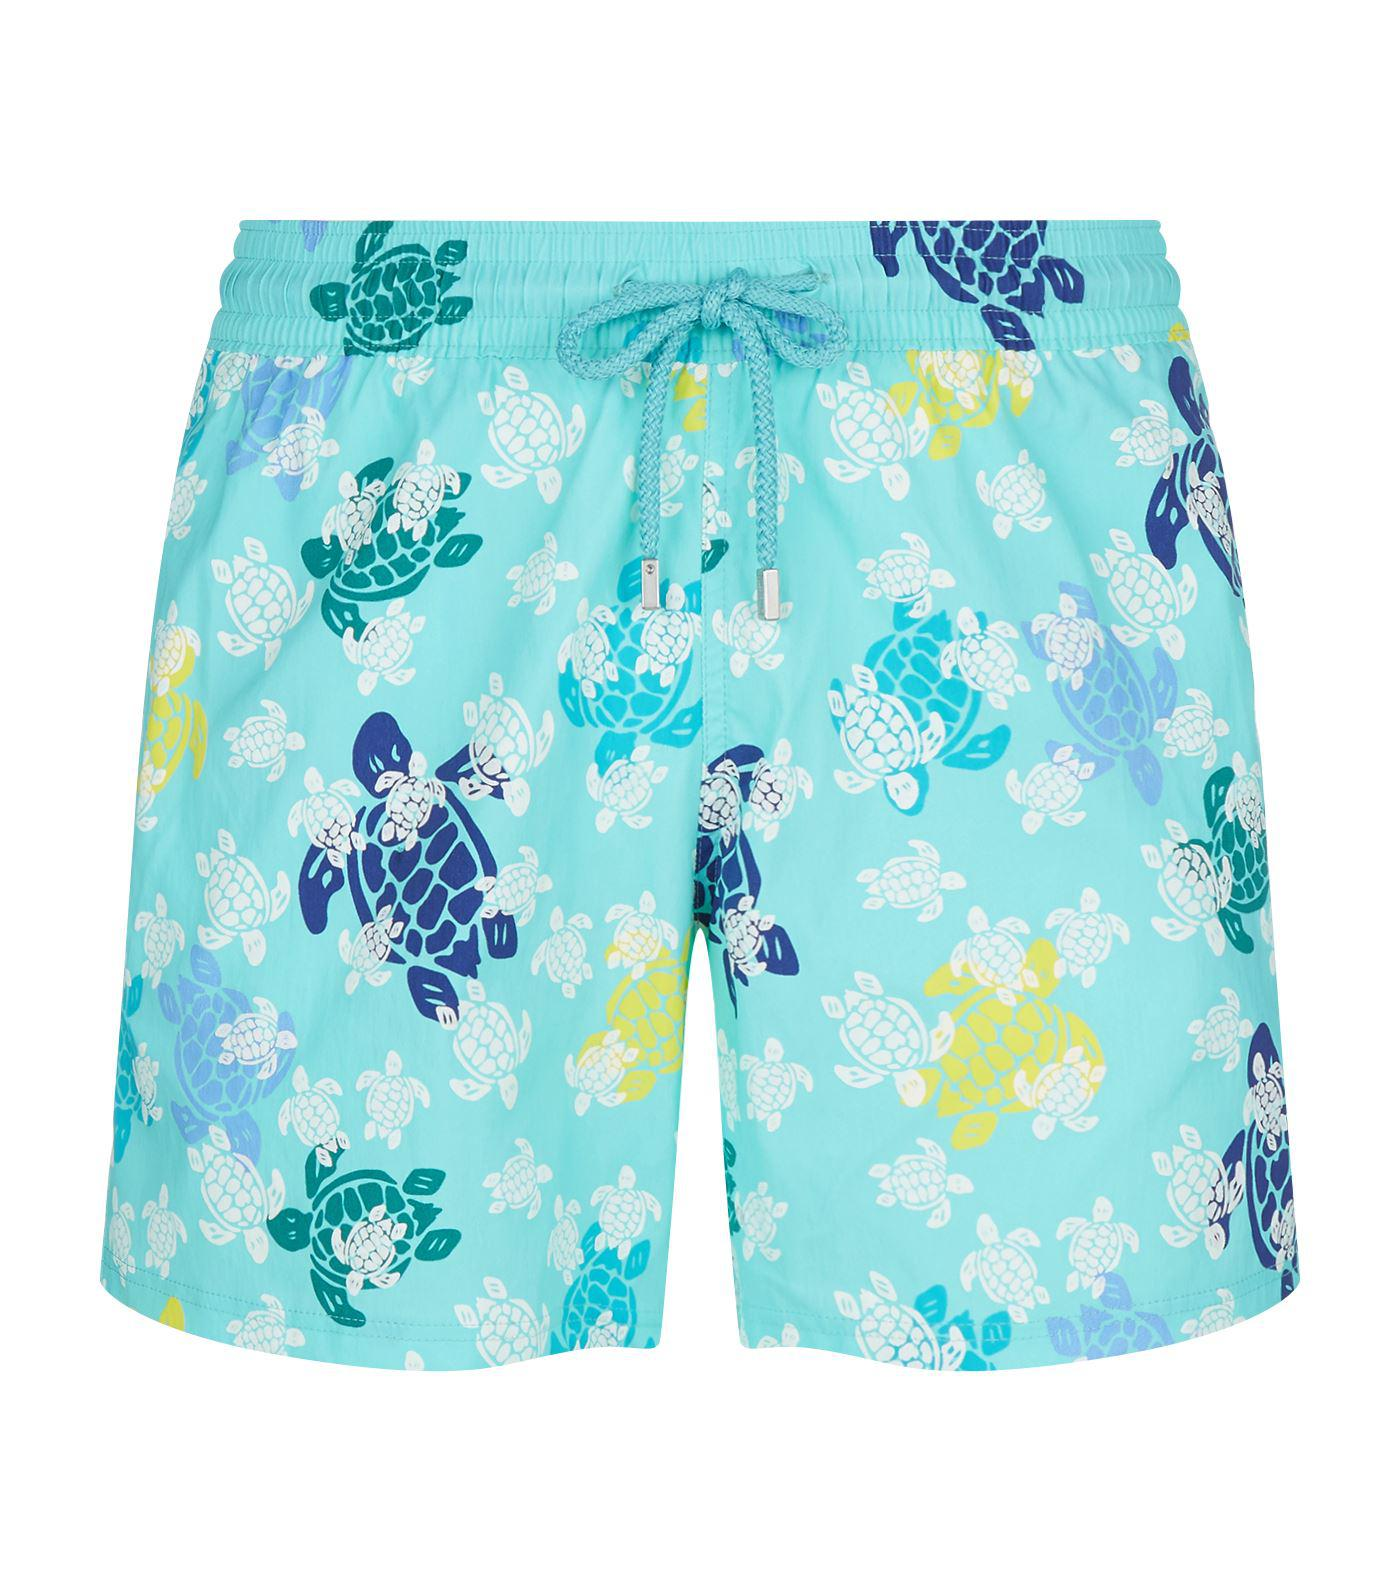 f0a44e4819796 Vilebrequin Moonrise Glow-in-the-dark Swim Shorts in Blue for Men - Lyst